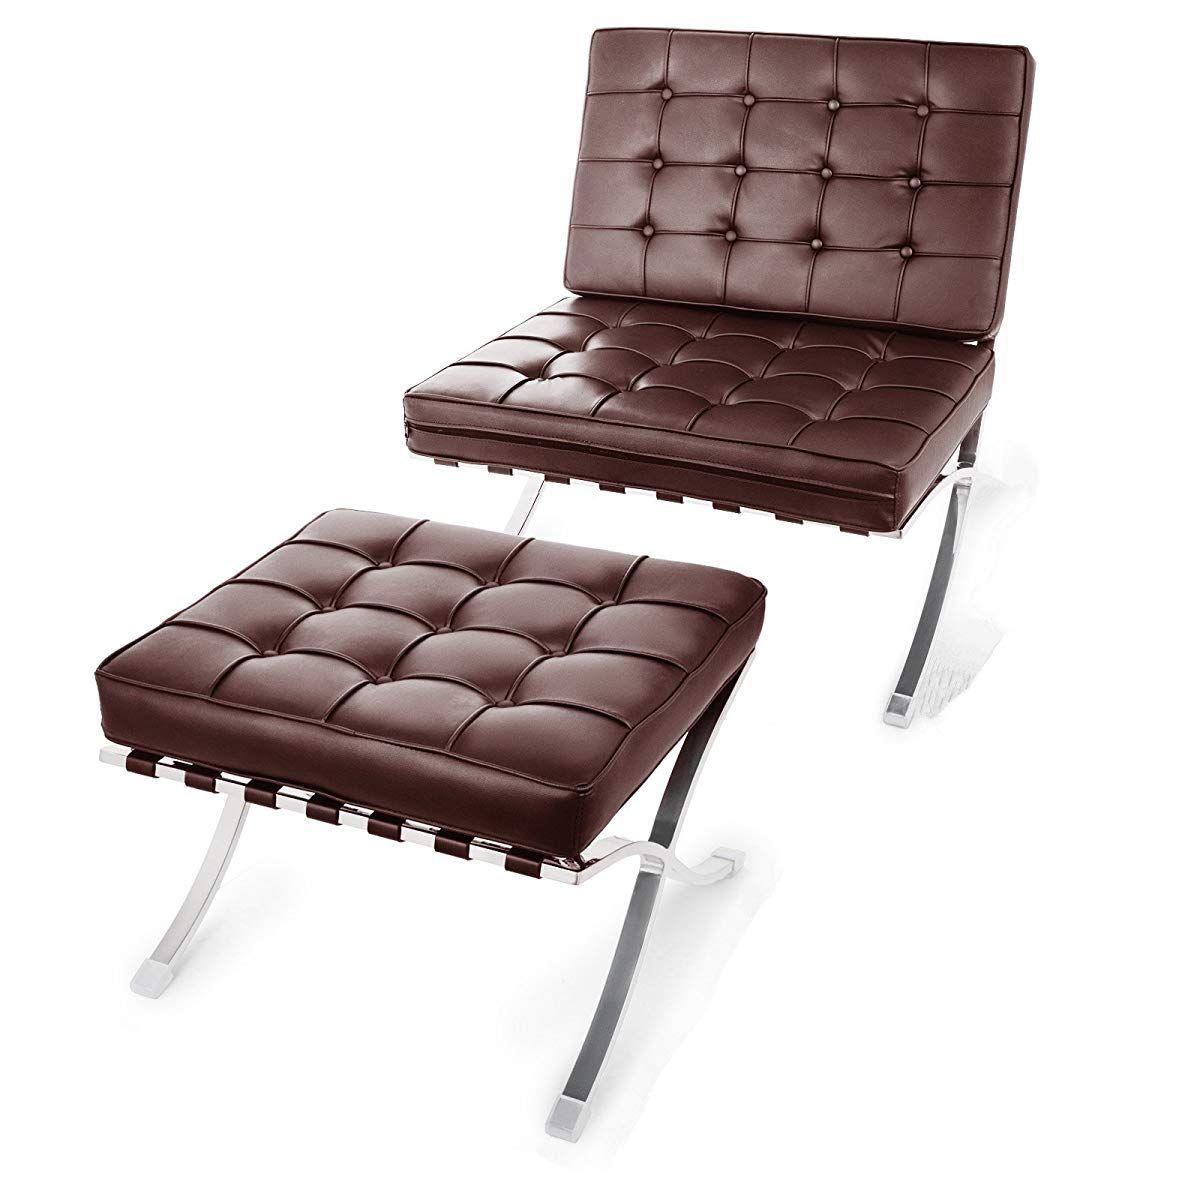 Happybuy Barcelona Style Lounge Chair and Ottoman Set PU